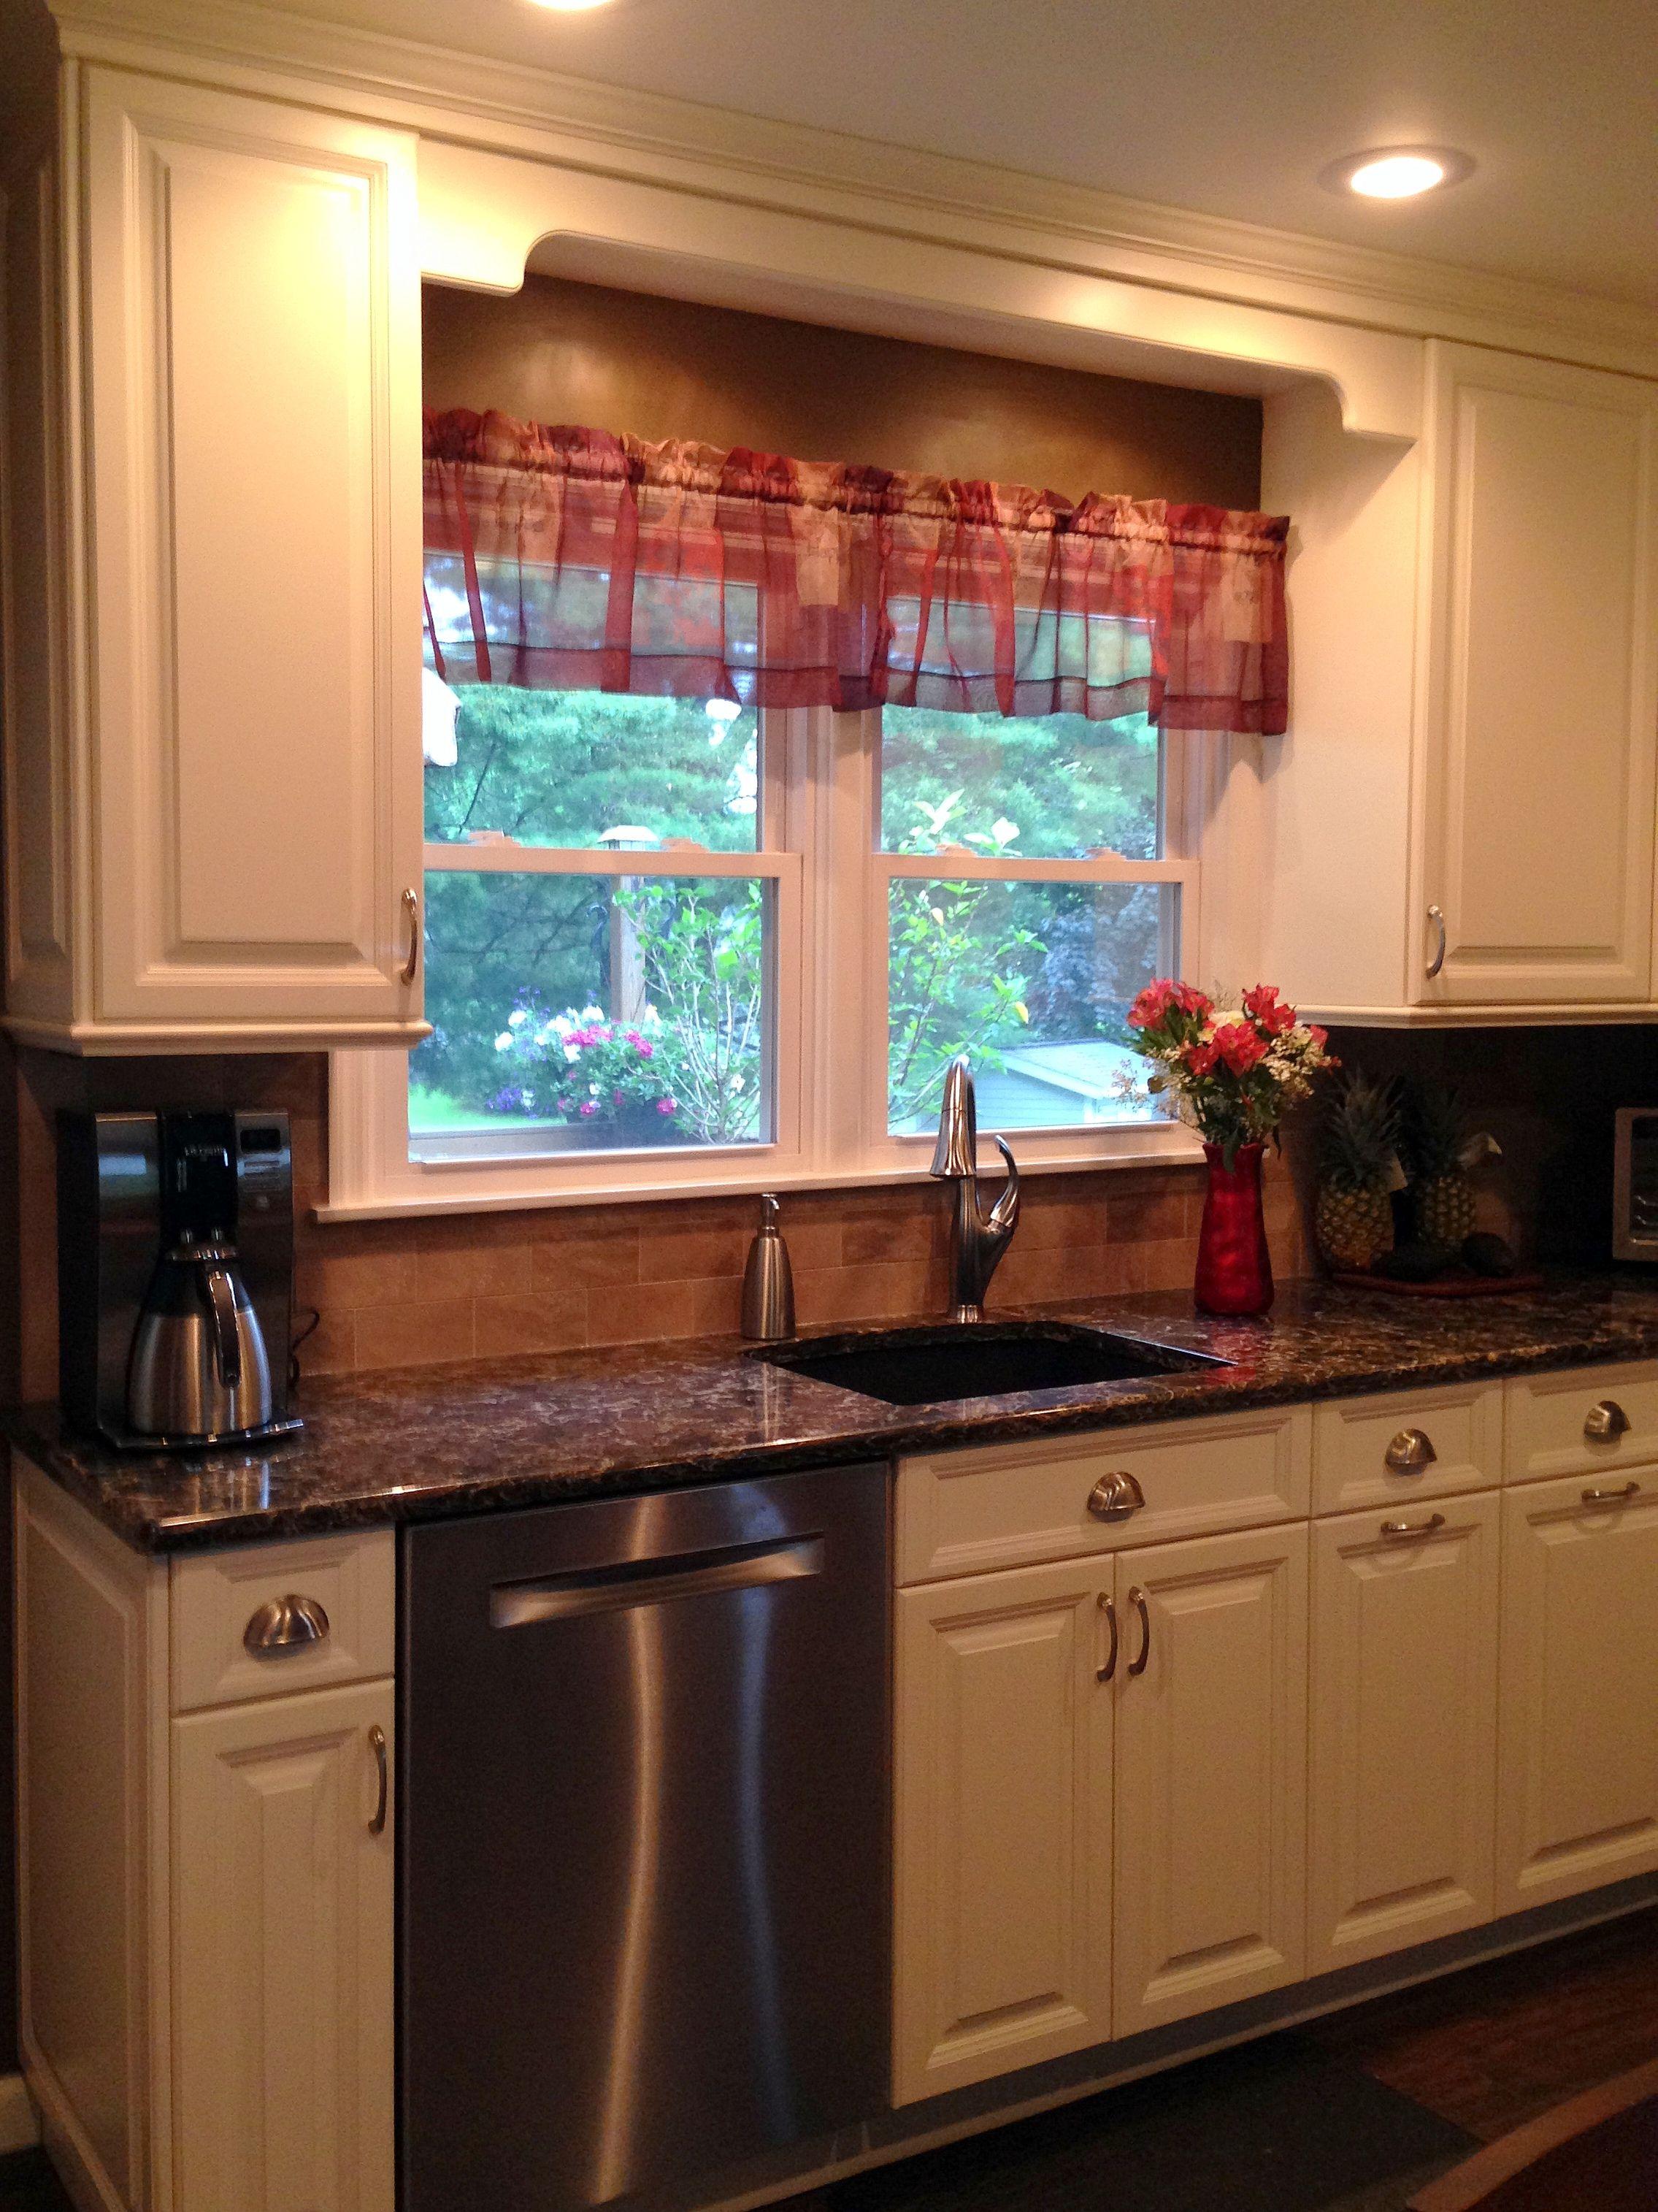 White Millbrook Kitchen With Laneshaw Quartz Countertops 4 Of 10 Kitchen Kitchens Bathrooms Quartz Countertops